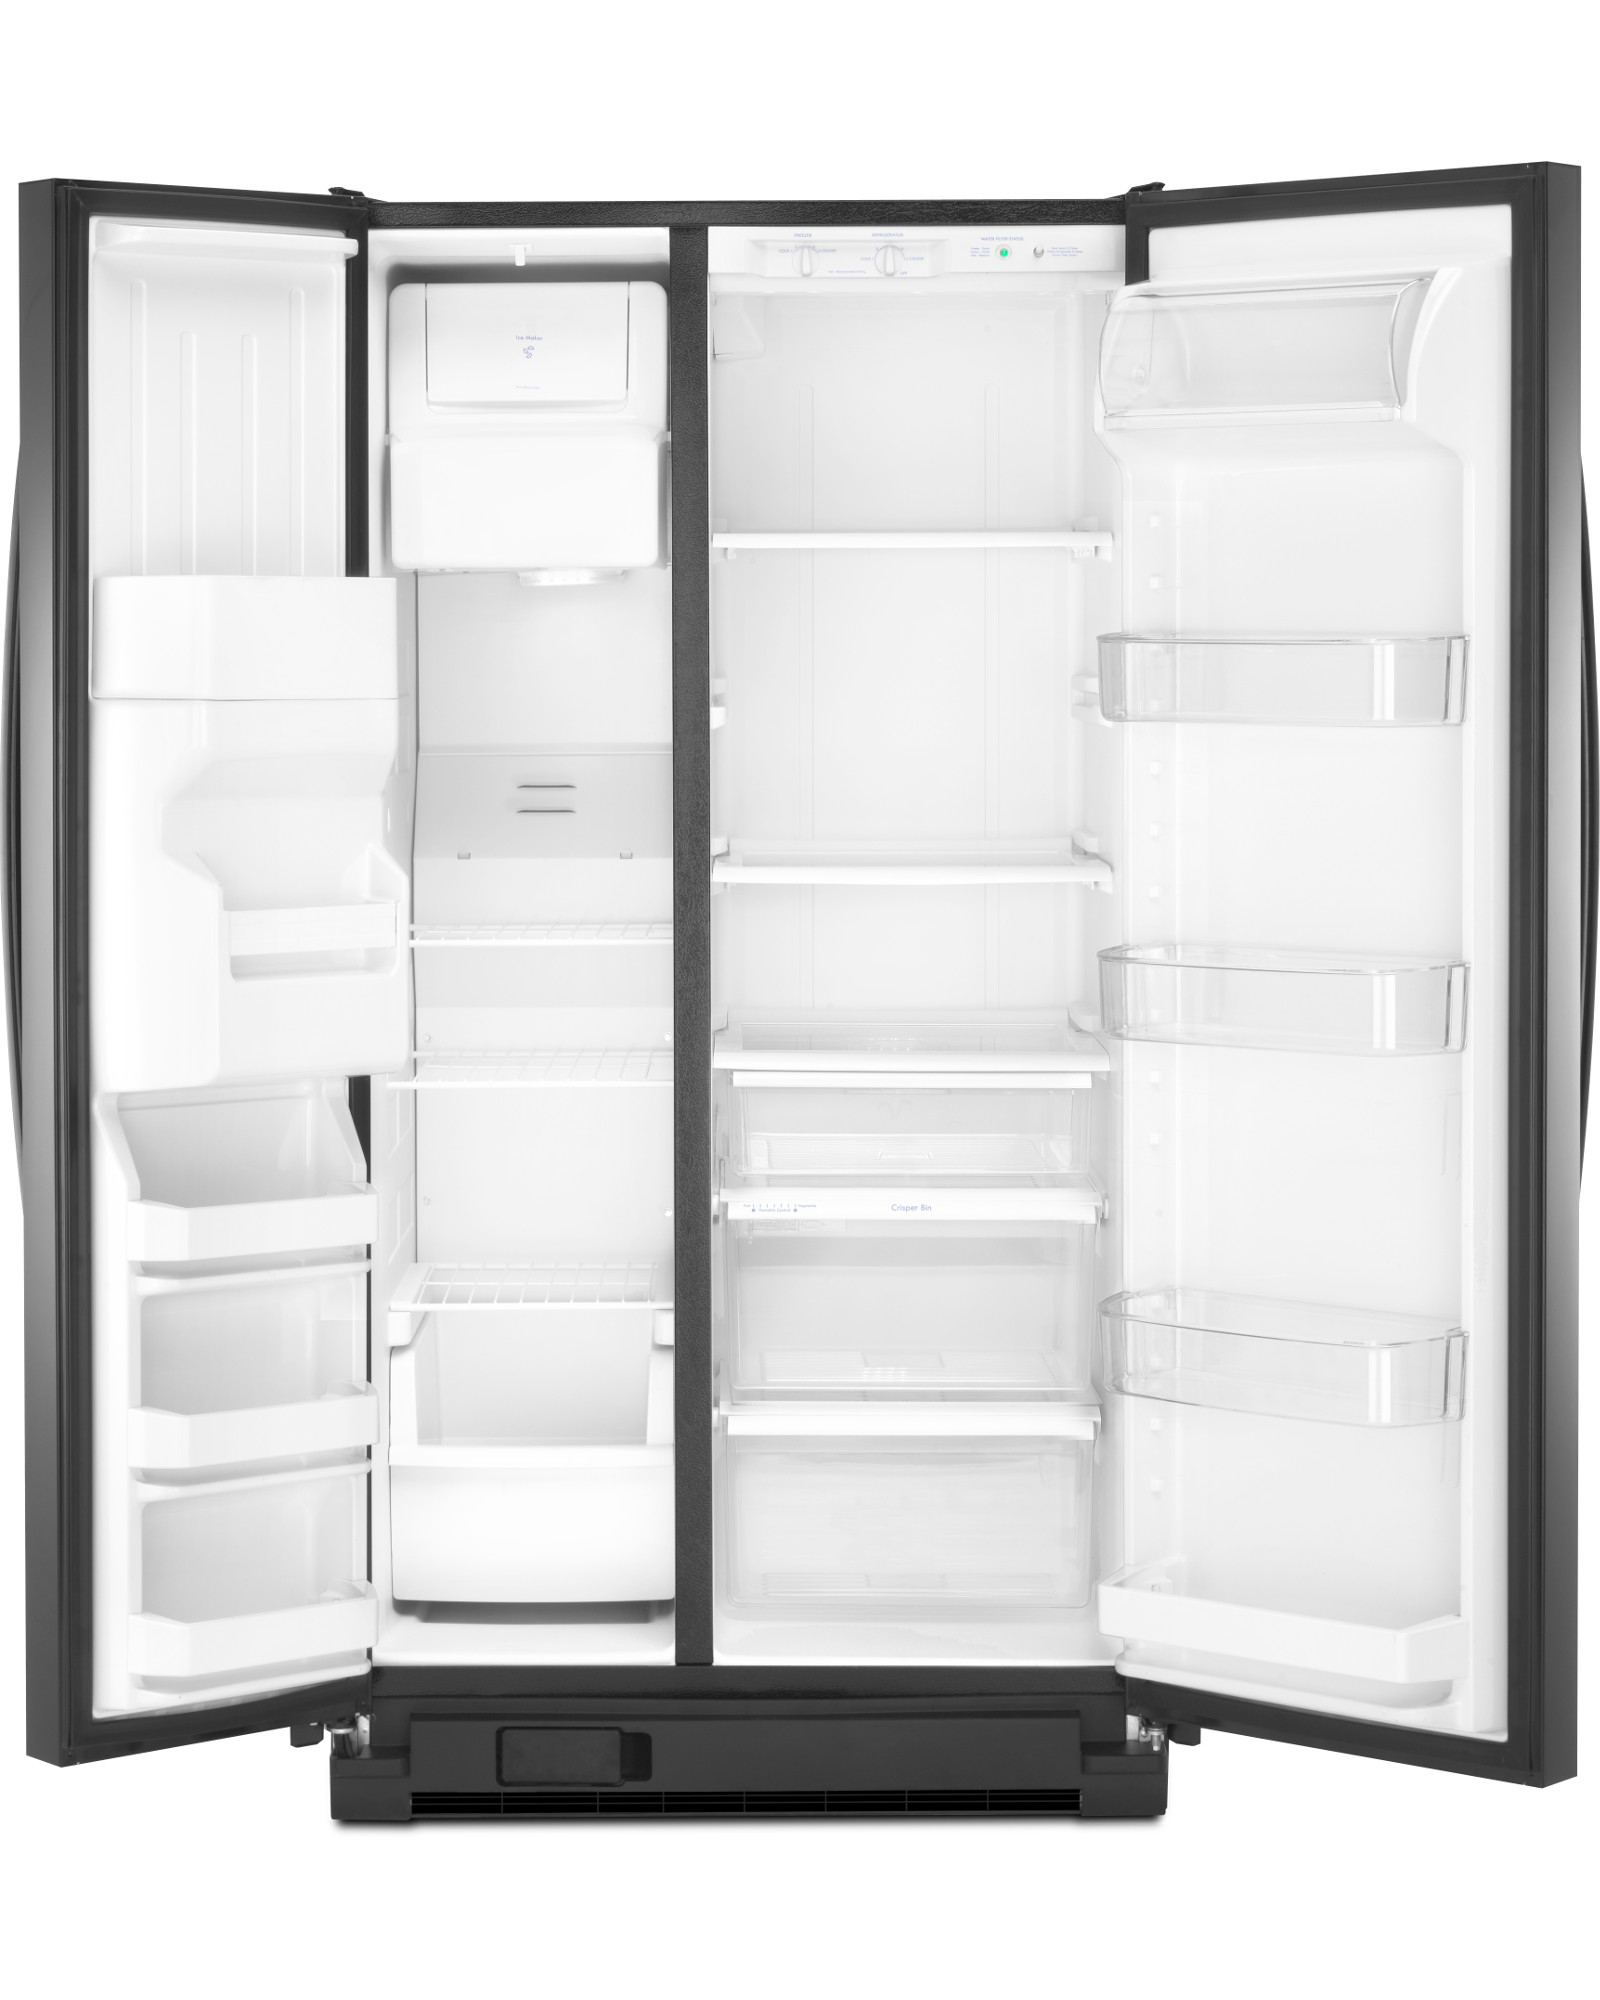 Kenmore 51729 25 cu. ft. Side-by-Side Refrigerator w/ SmartSense™ Cooling Technology - Black - 51729